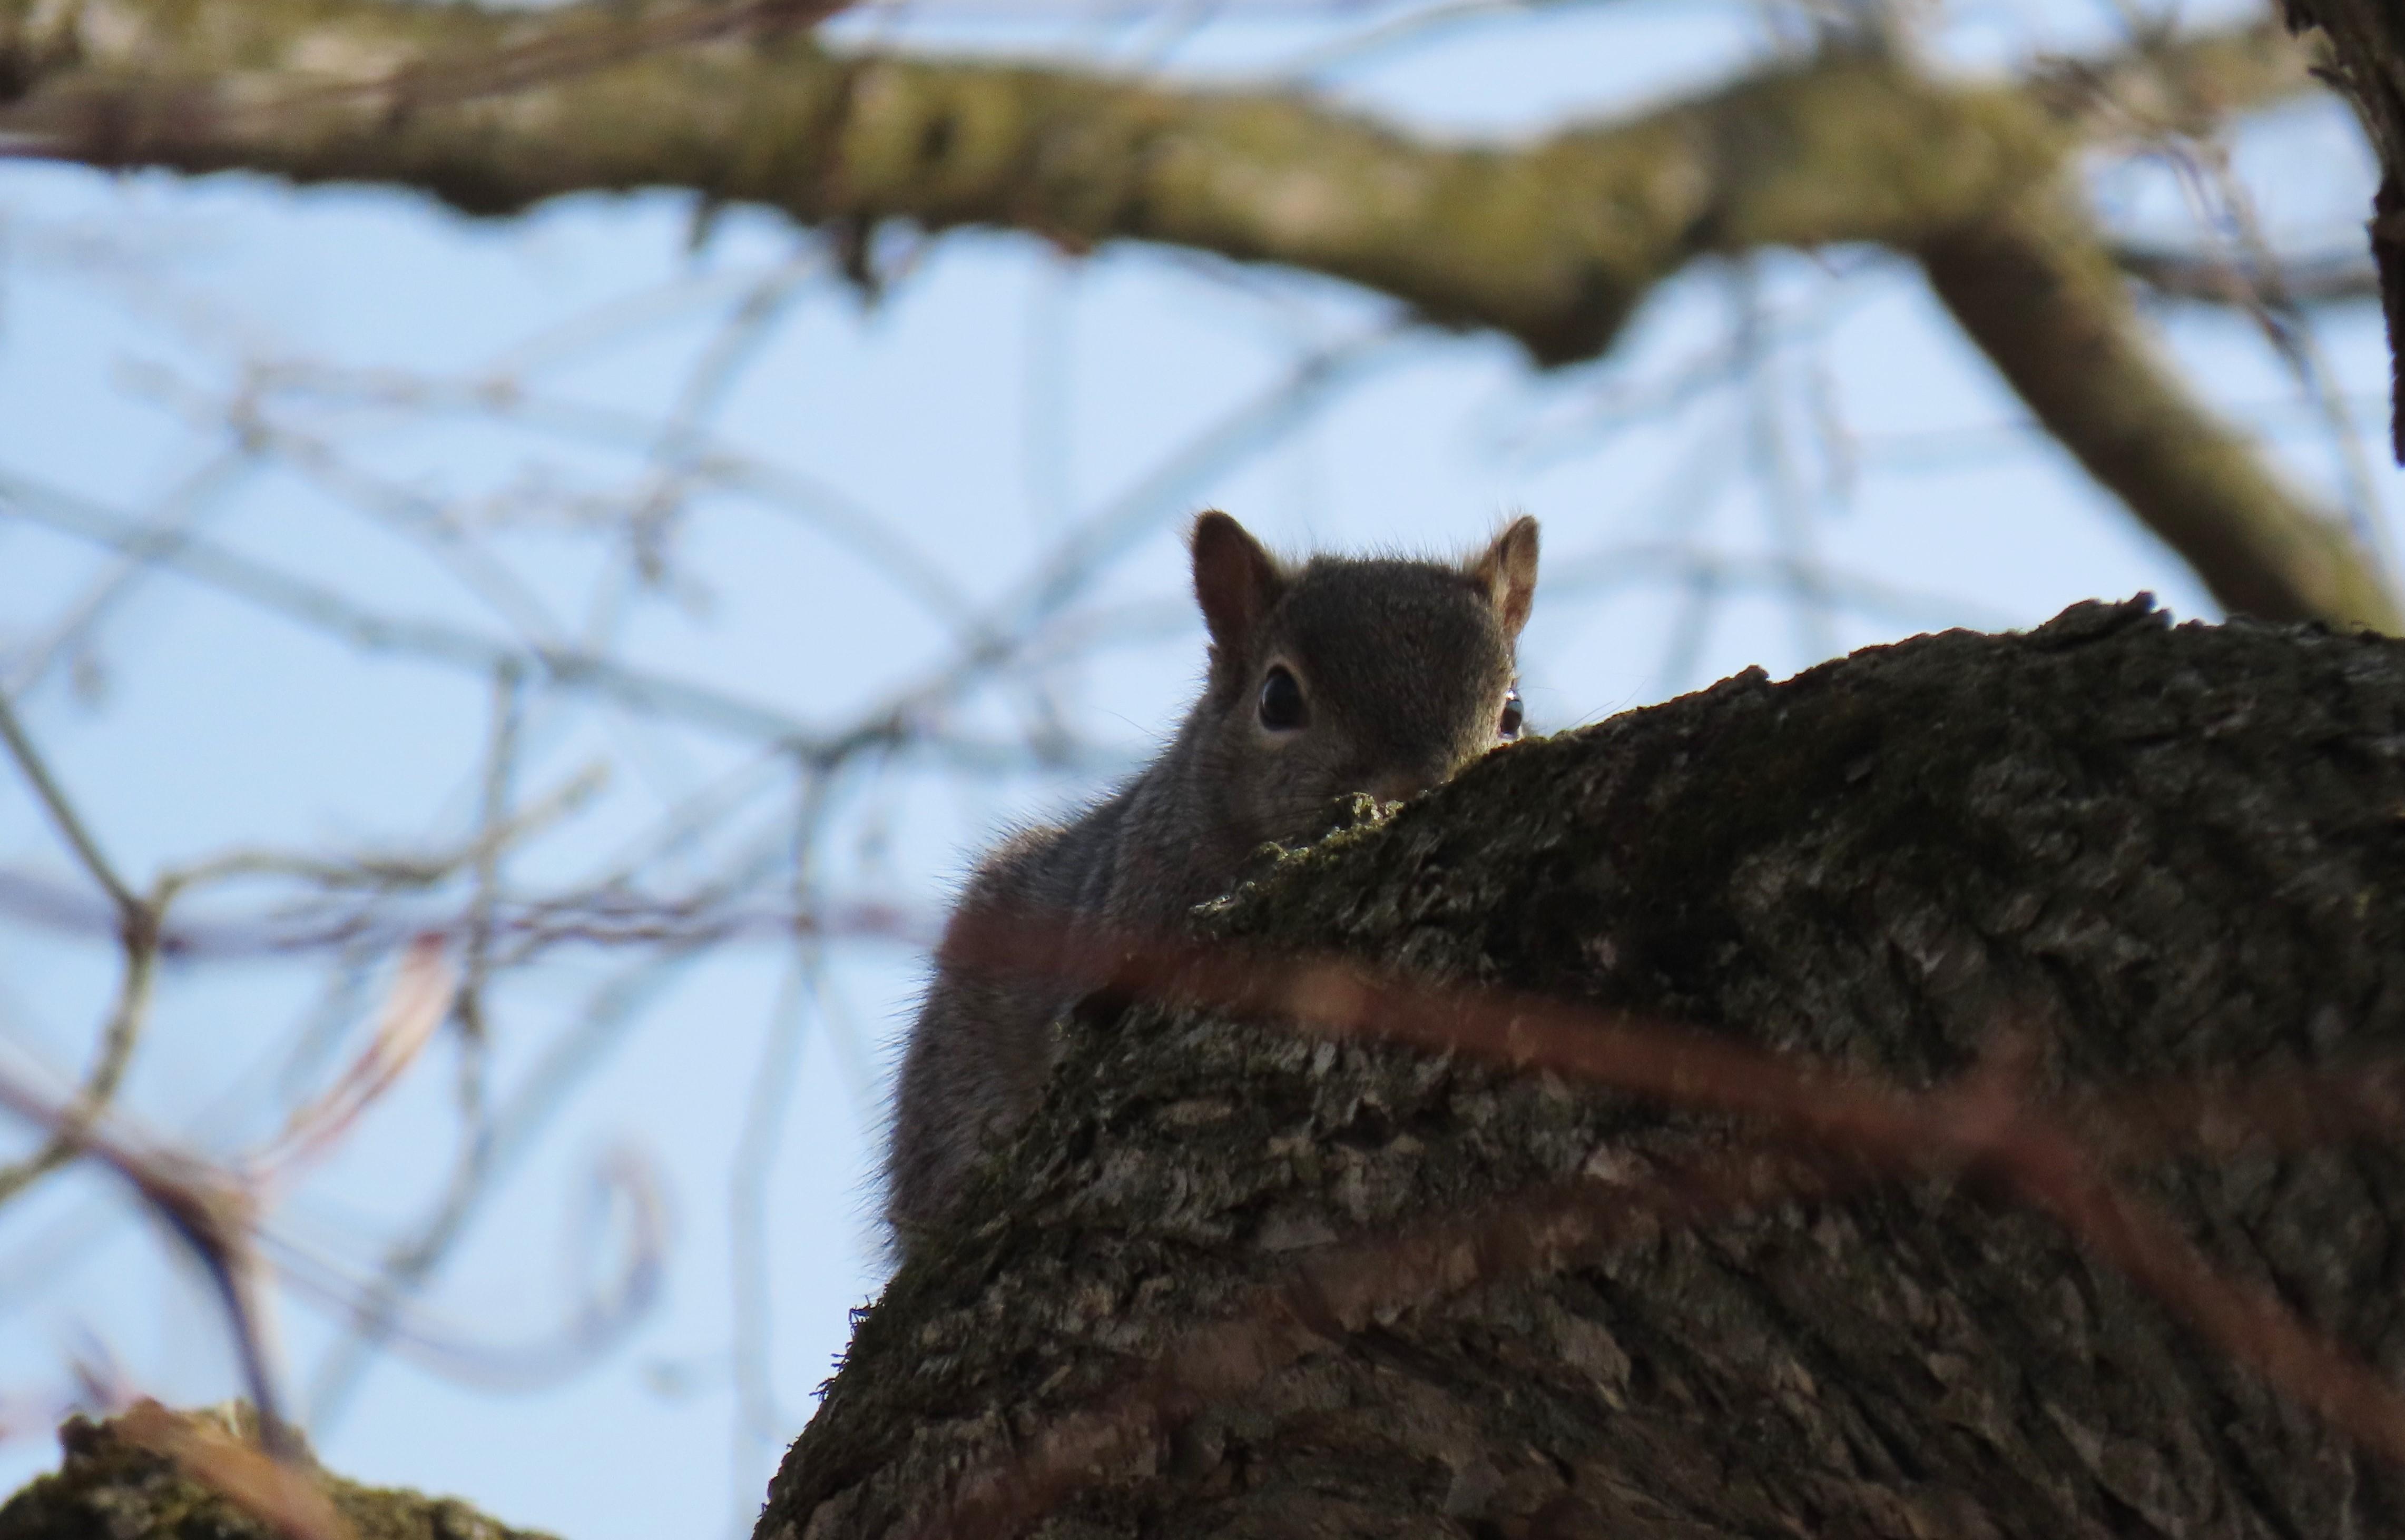 A squirrel, half hidden, rests on a tree branch